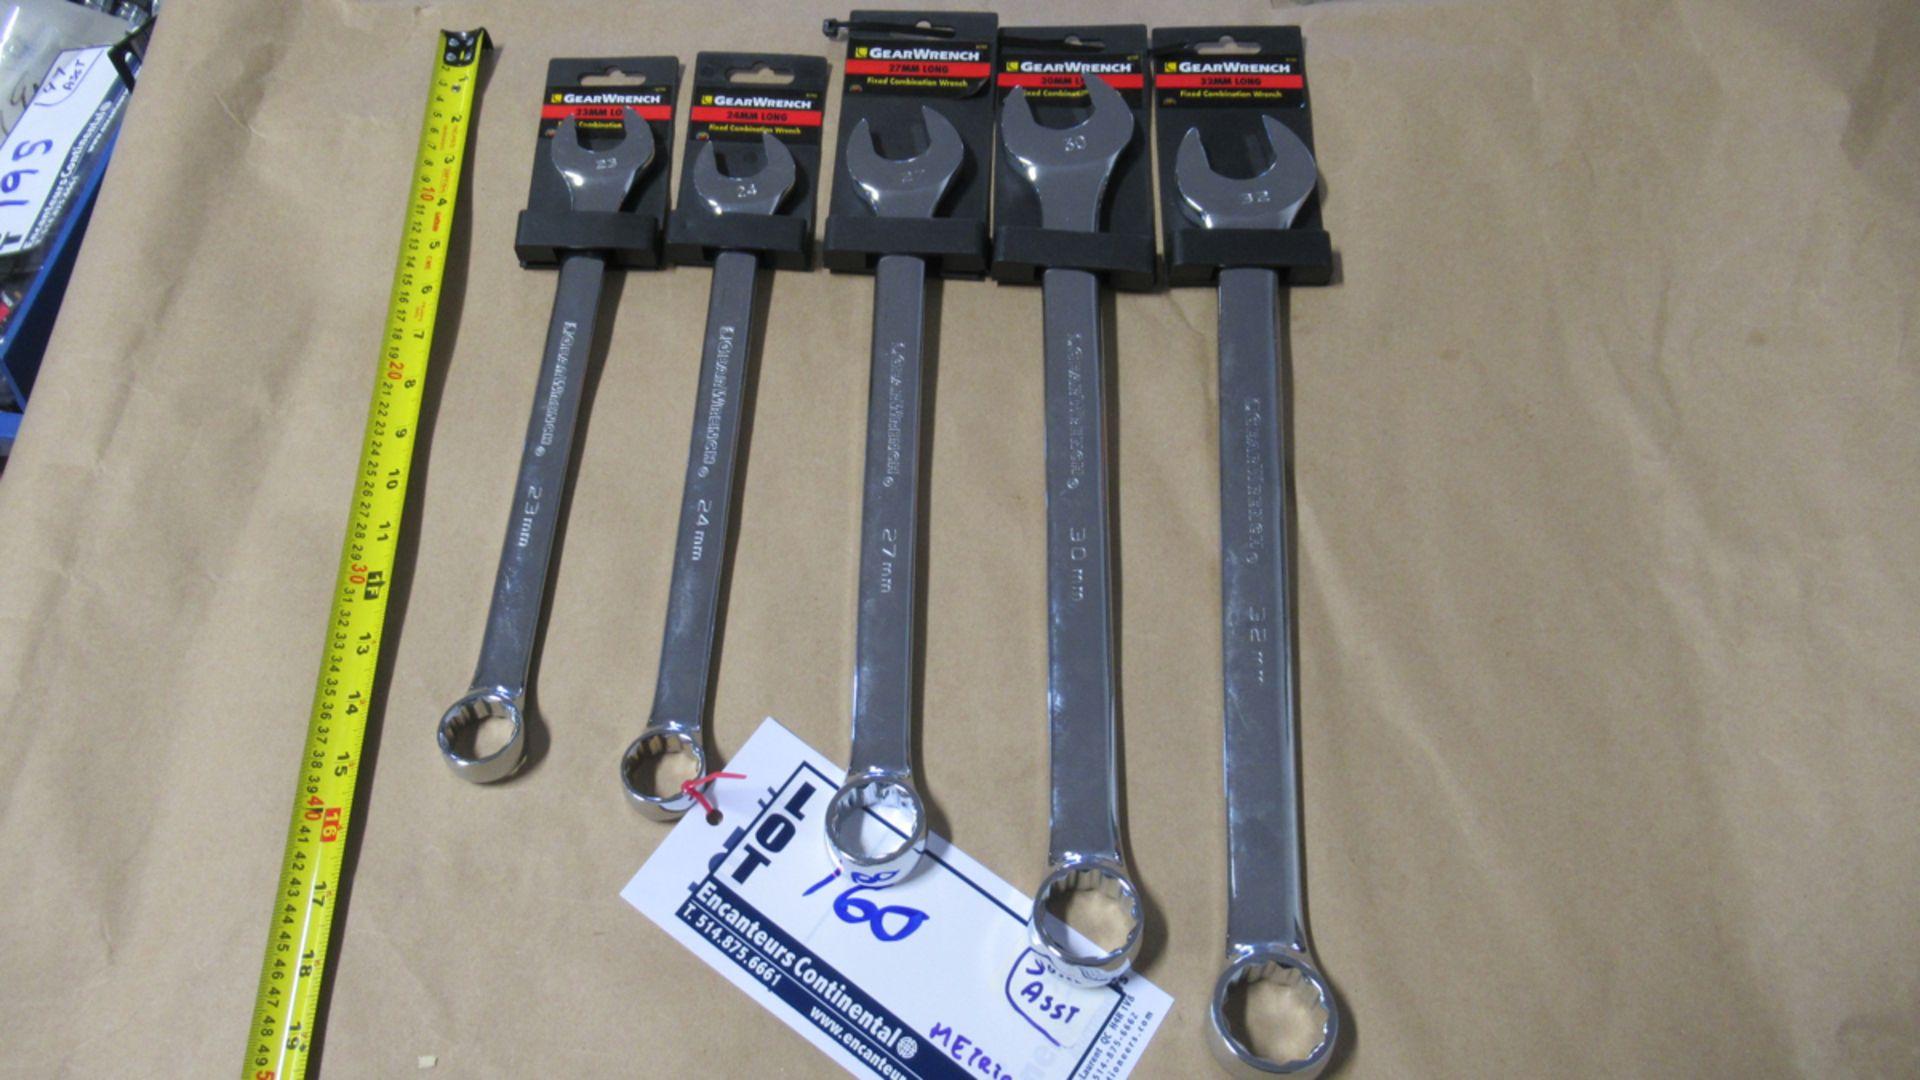 Lot 160 - ENS DE 5 CLES METRIC 23,24,27,30&32mm LONG FIXED COMBINATION WRENCH GW